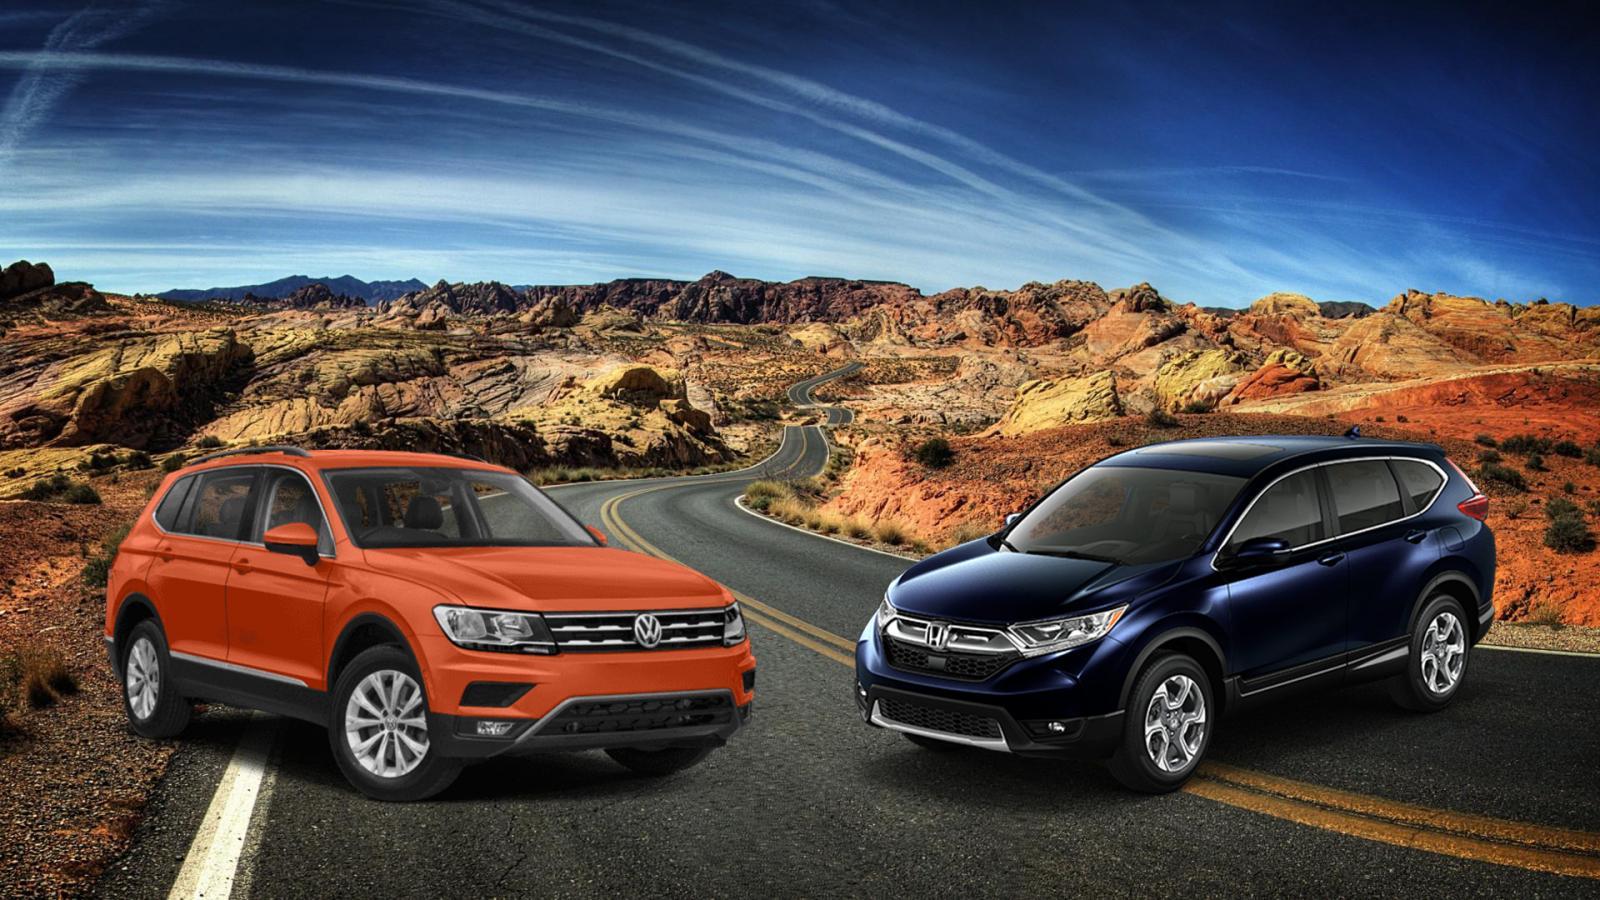 Comparativa: Volkswagen Tiguan Trendline Plus 2019 vs Honda CR-V EX 2019